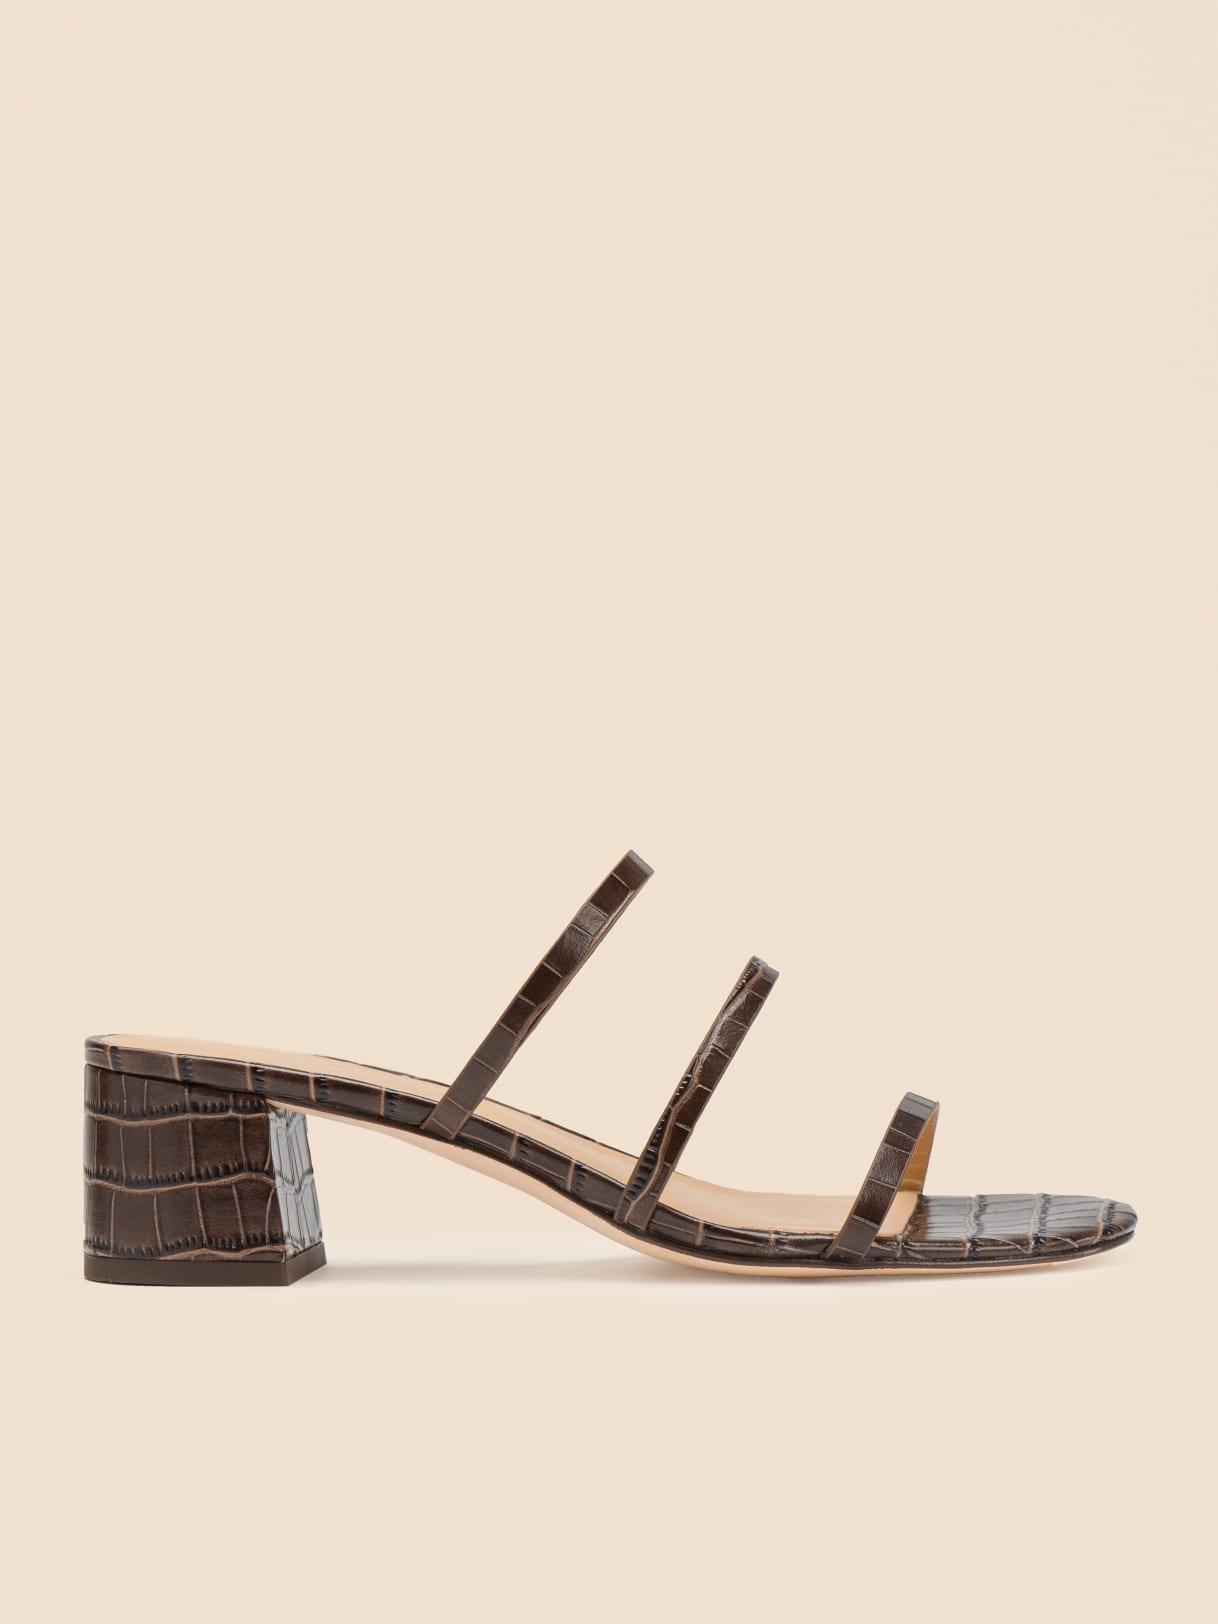 reformation-menage-sandal.jpg